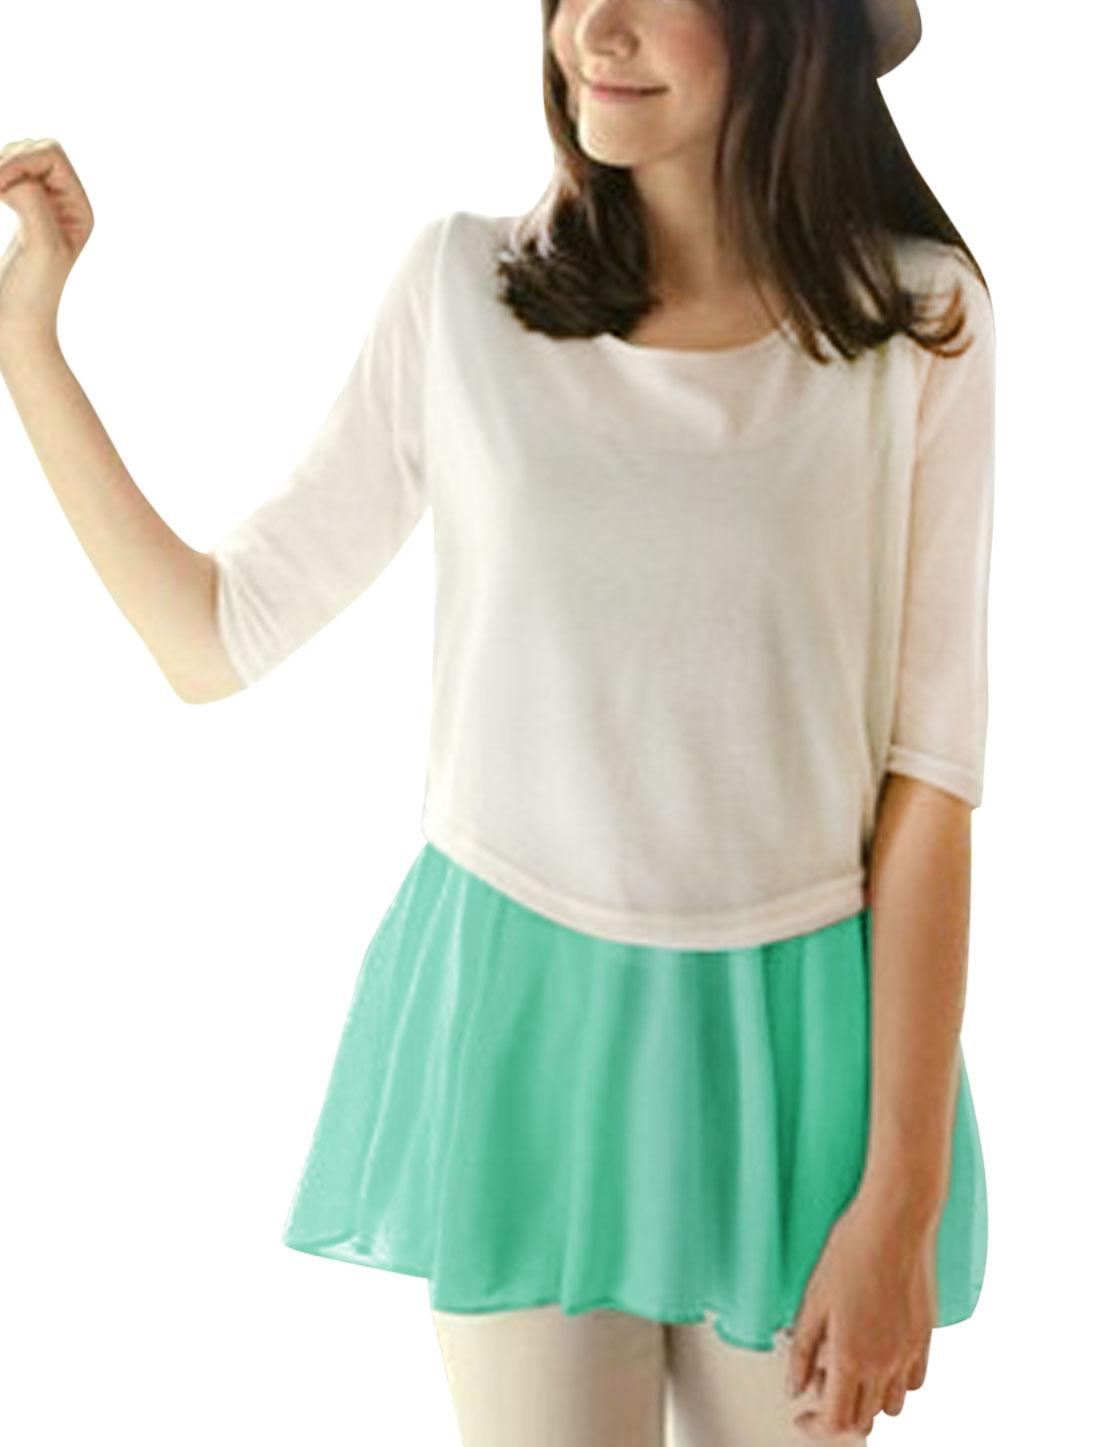 Lady 3/4 Sleeve Knit Top w Elastic Waist Semi Sheer Tunic Top Mint S